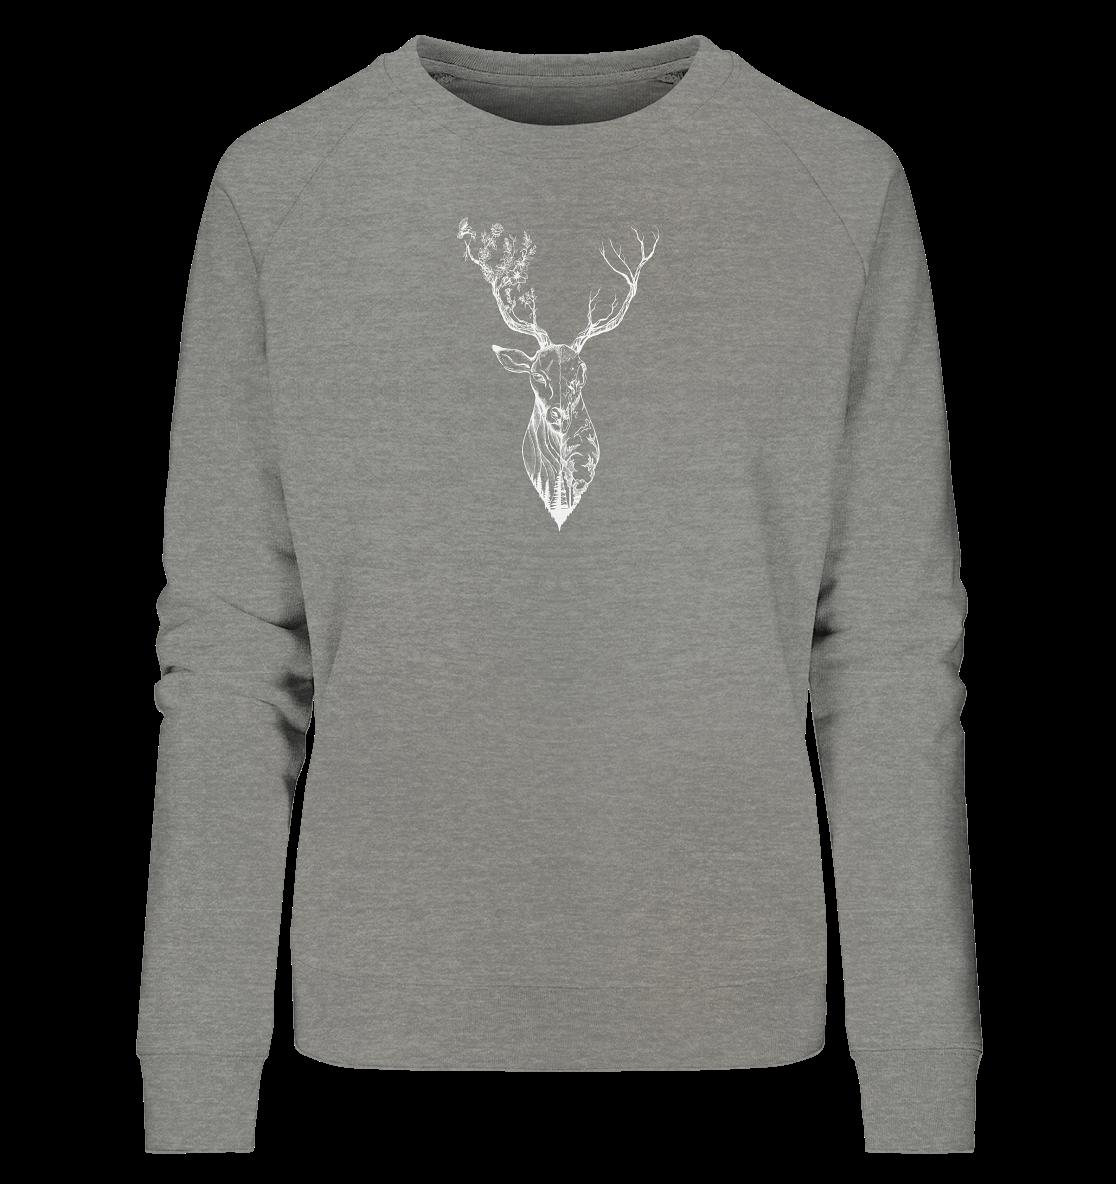 front-ladies-organic-sweatshirt-818381-1116x-15.png